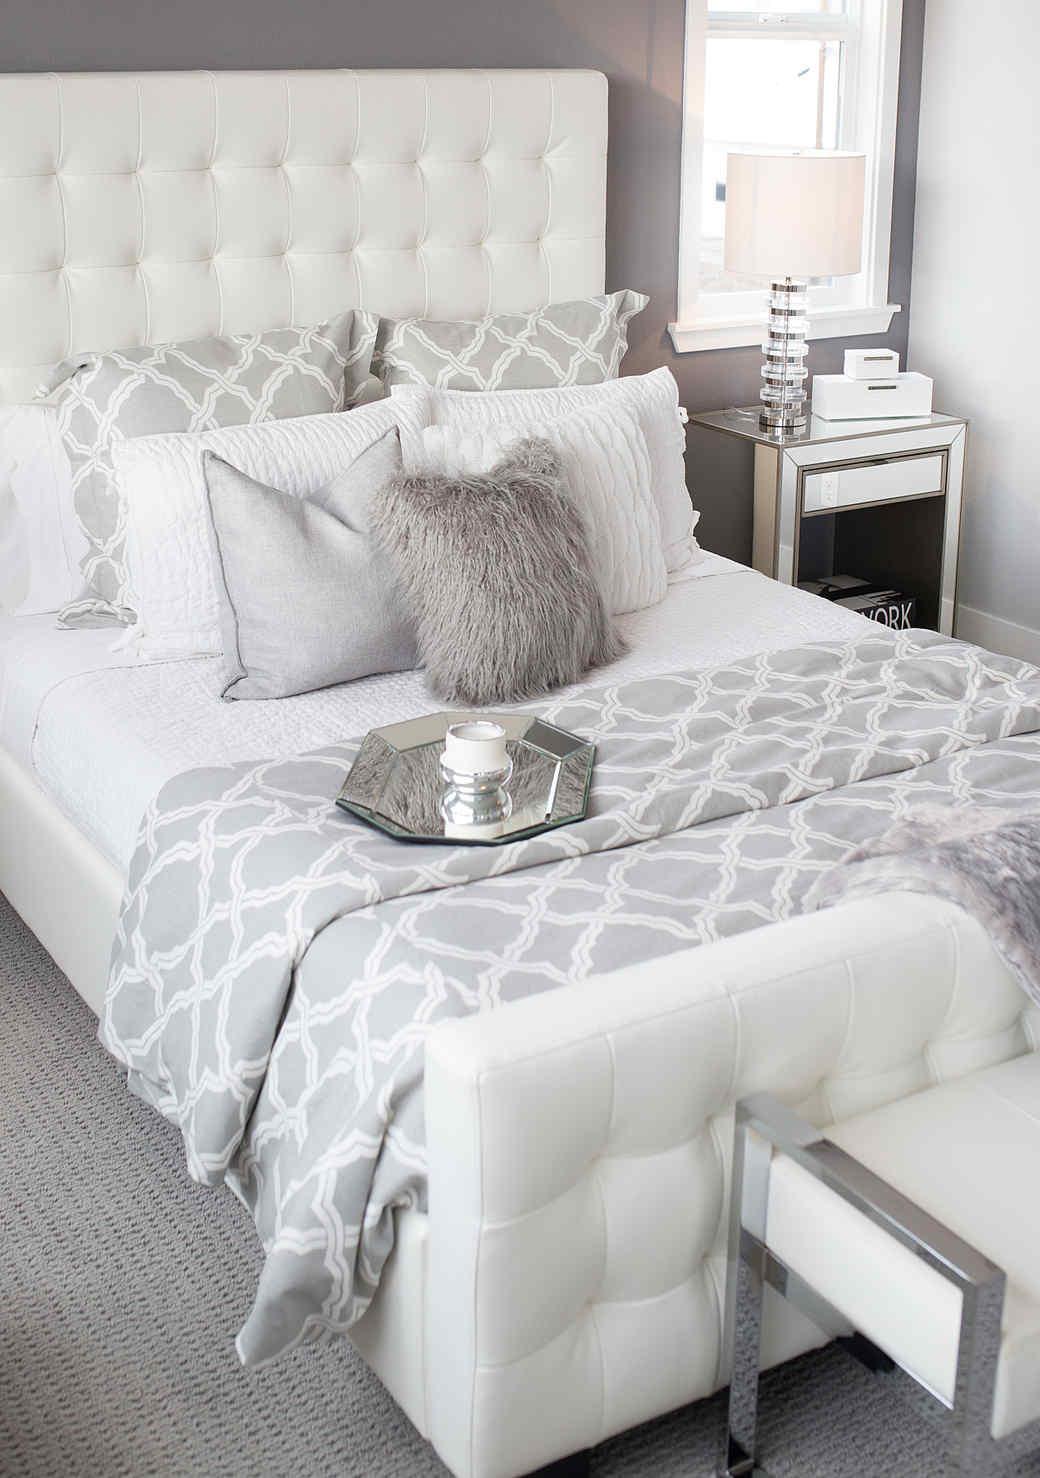 5 Ways to Cozy Up Your Bedroom Decor